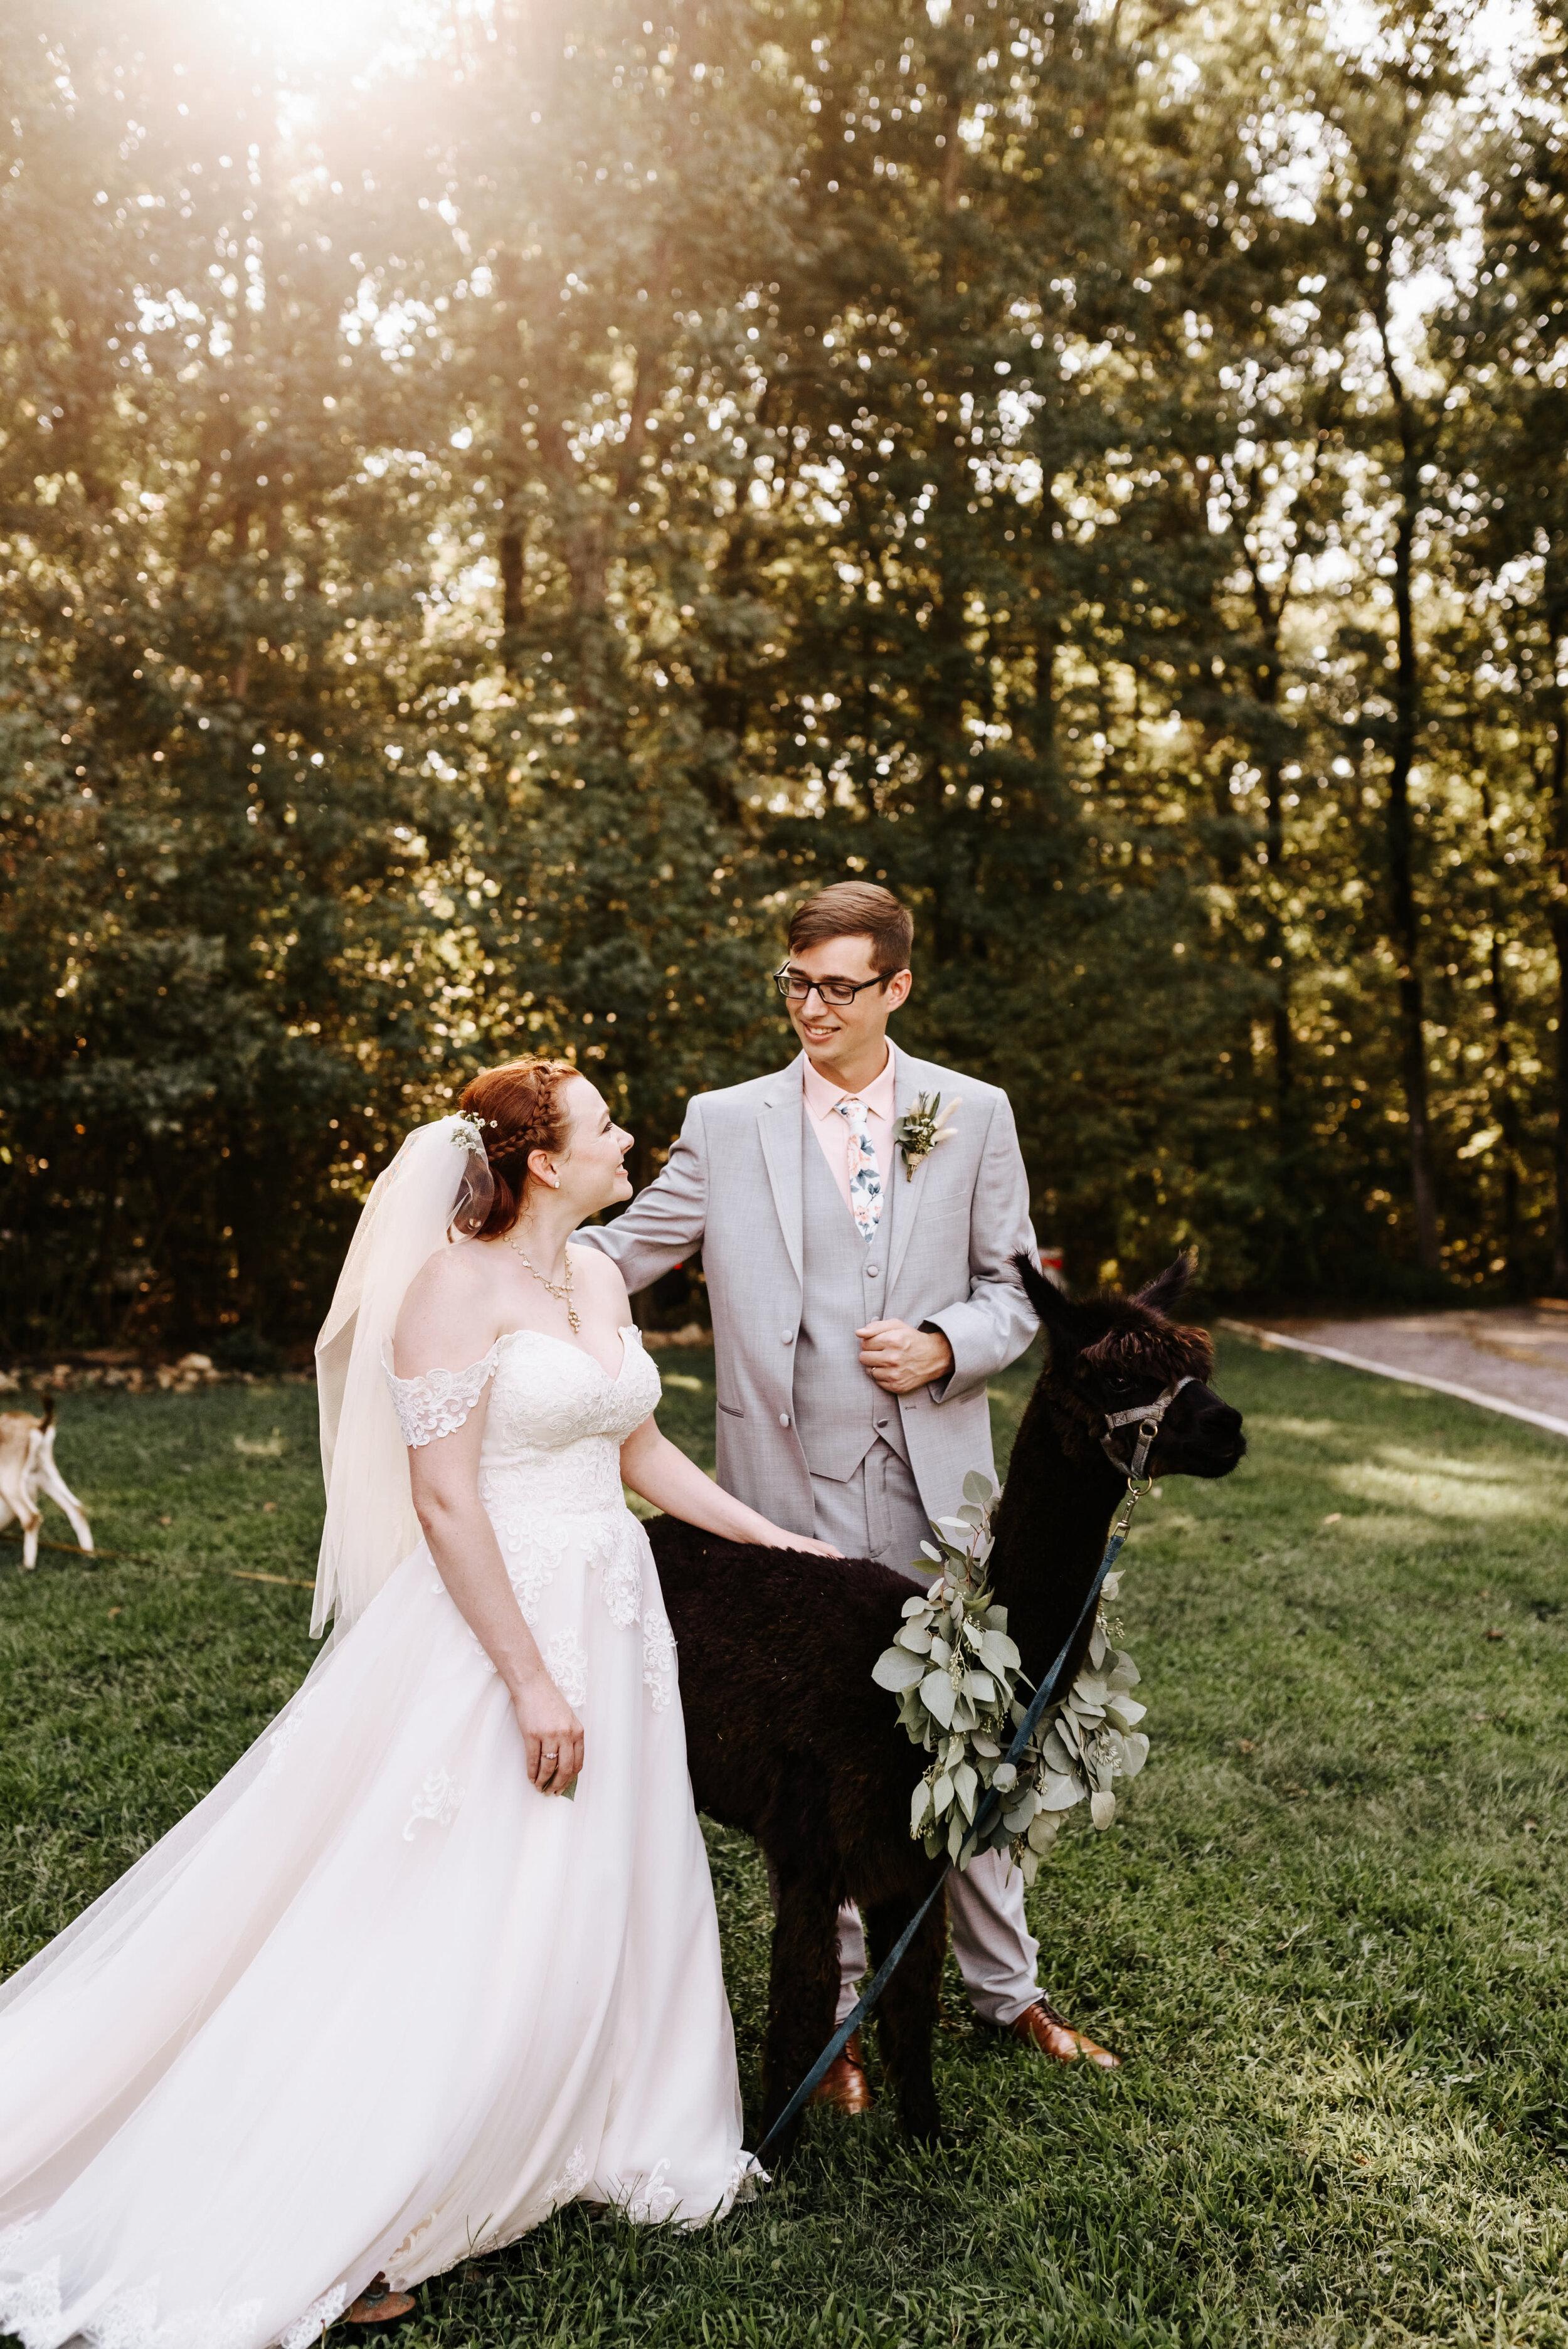 Rachel_David_Wedding_Richmond_Virginia_Photography_by_V_36.jpg